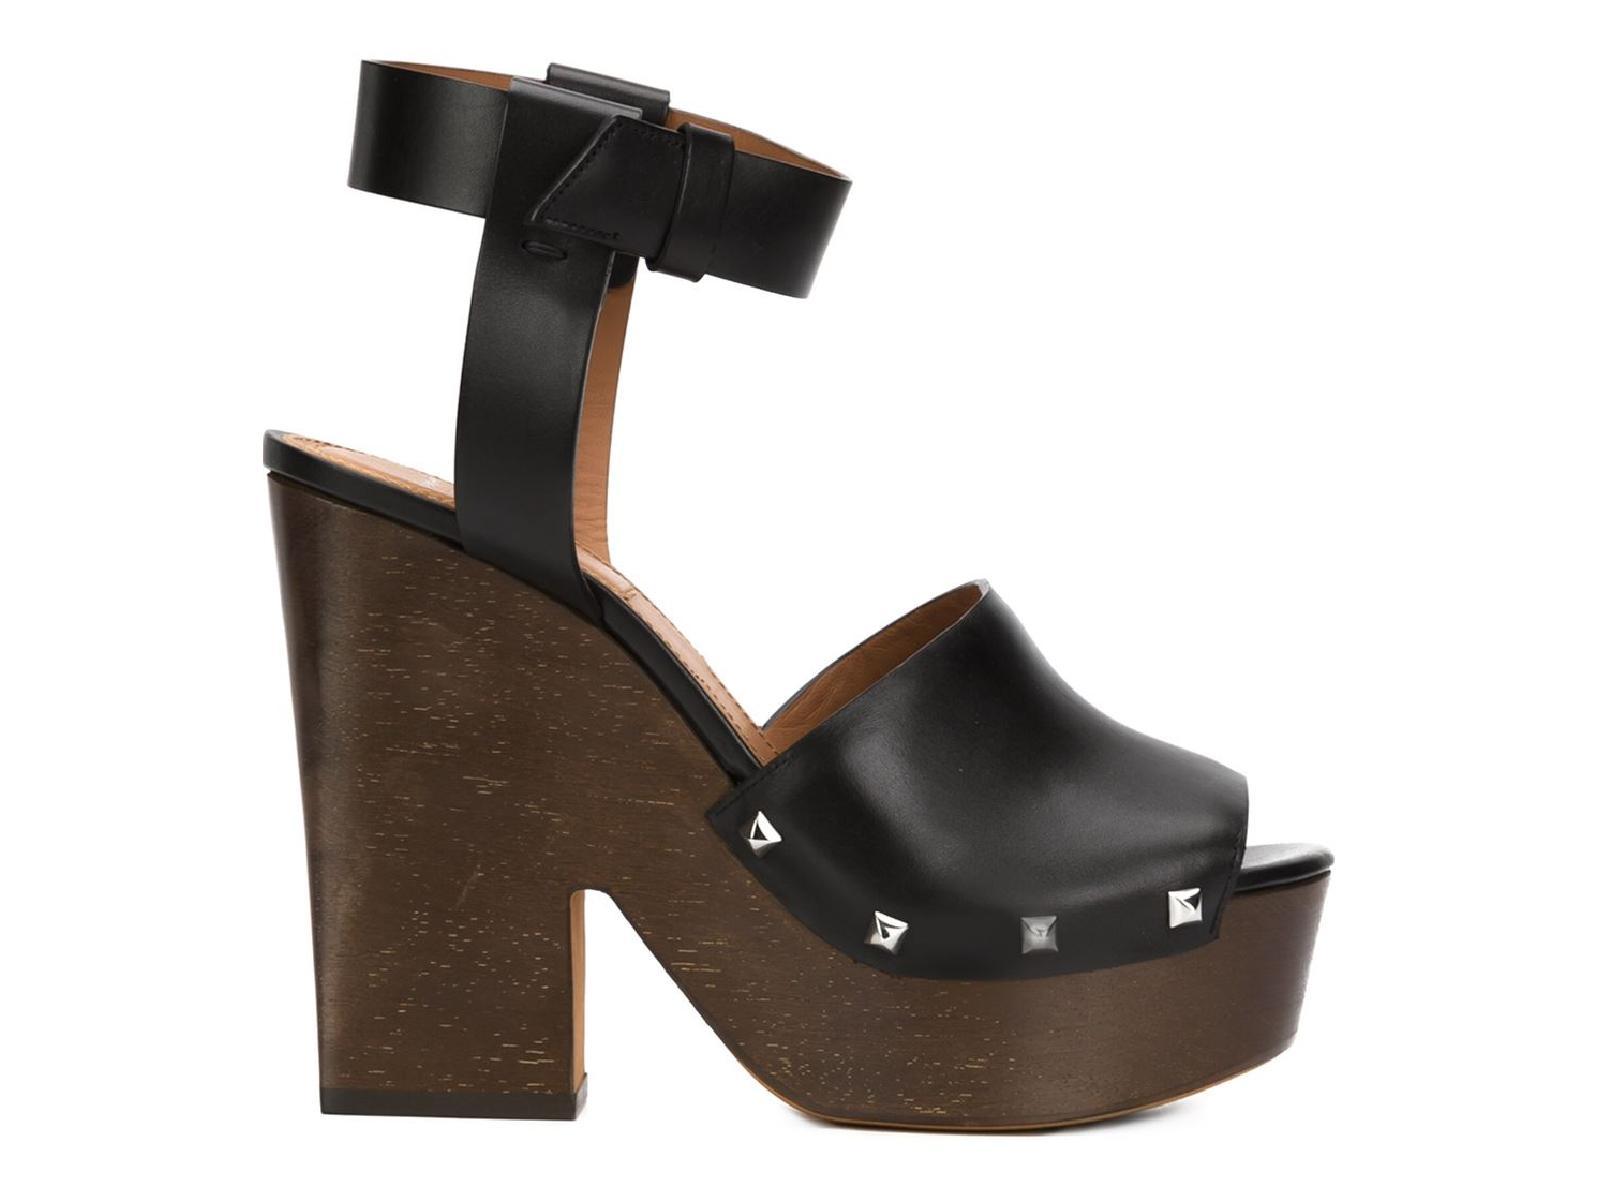 Artigiano Shoe Size Guide